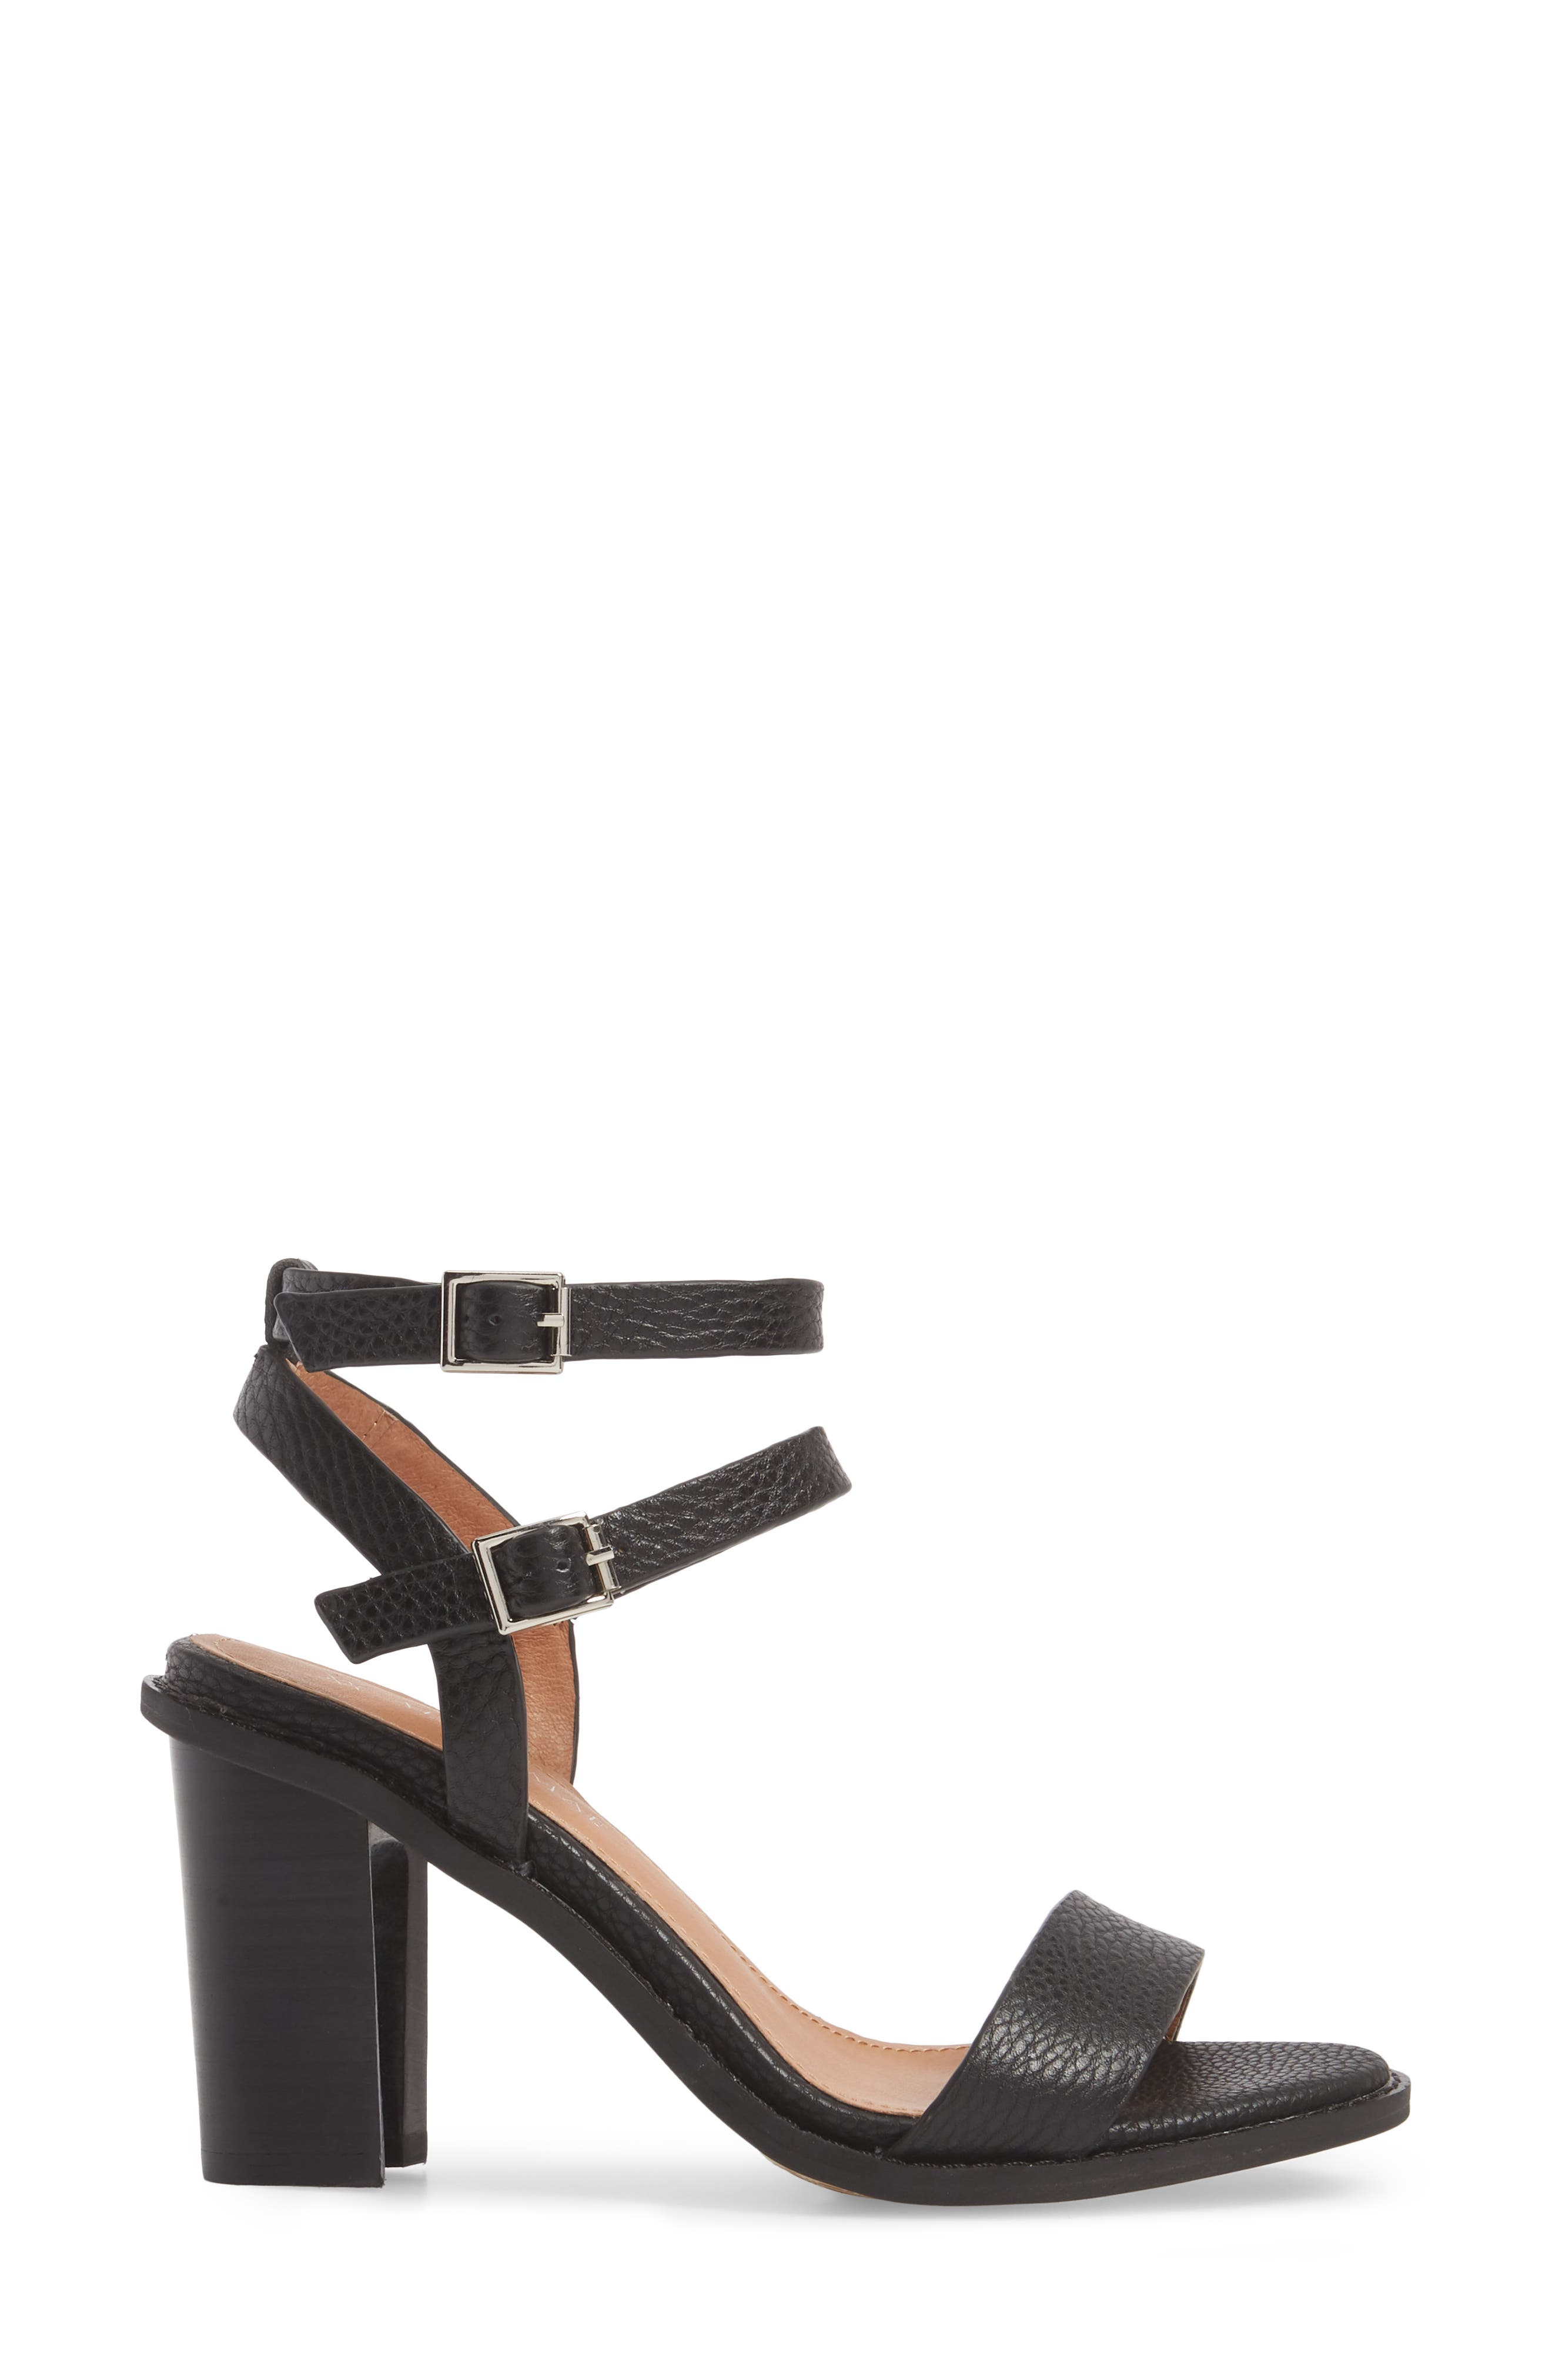 Elapse Sandal,                             Alternate thumbnail 3, color,                             Black Leather